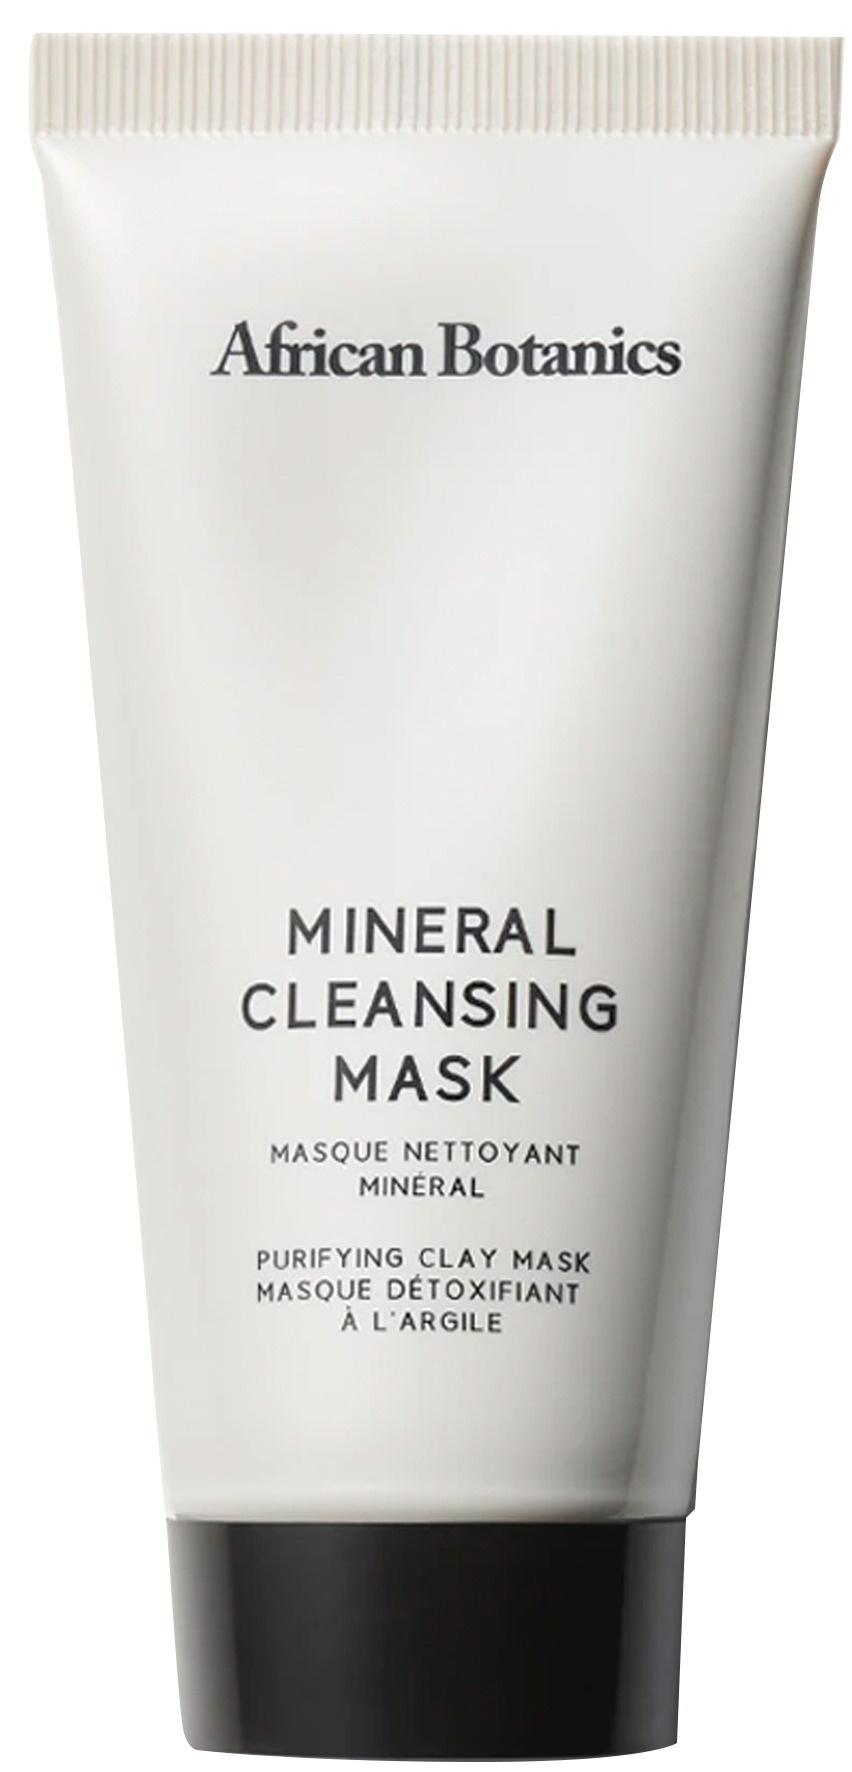 African Botanics Marula Mineral Cleansing Mask